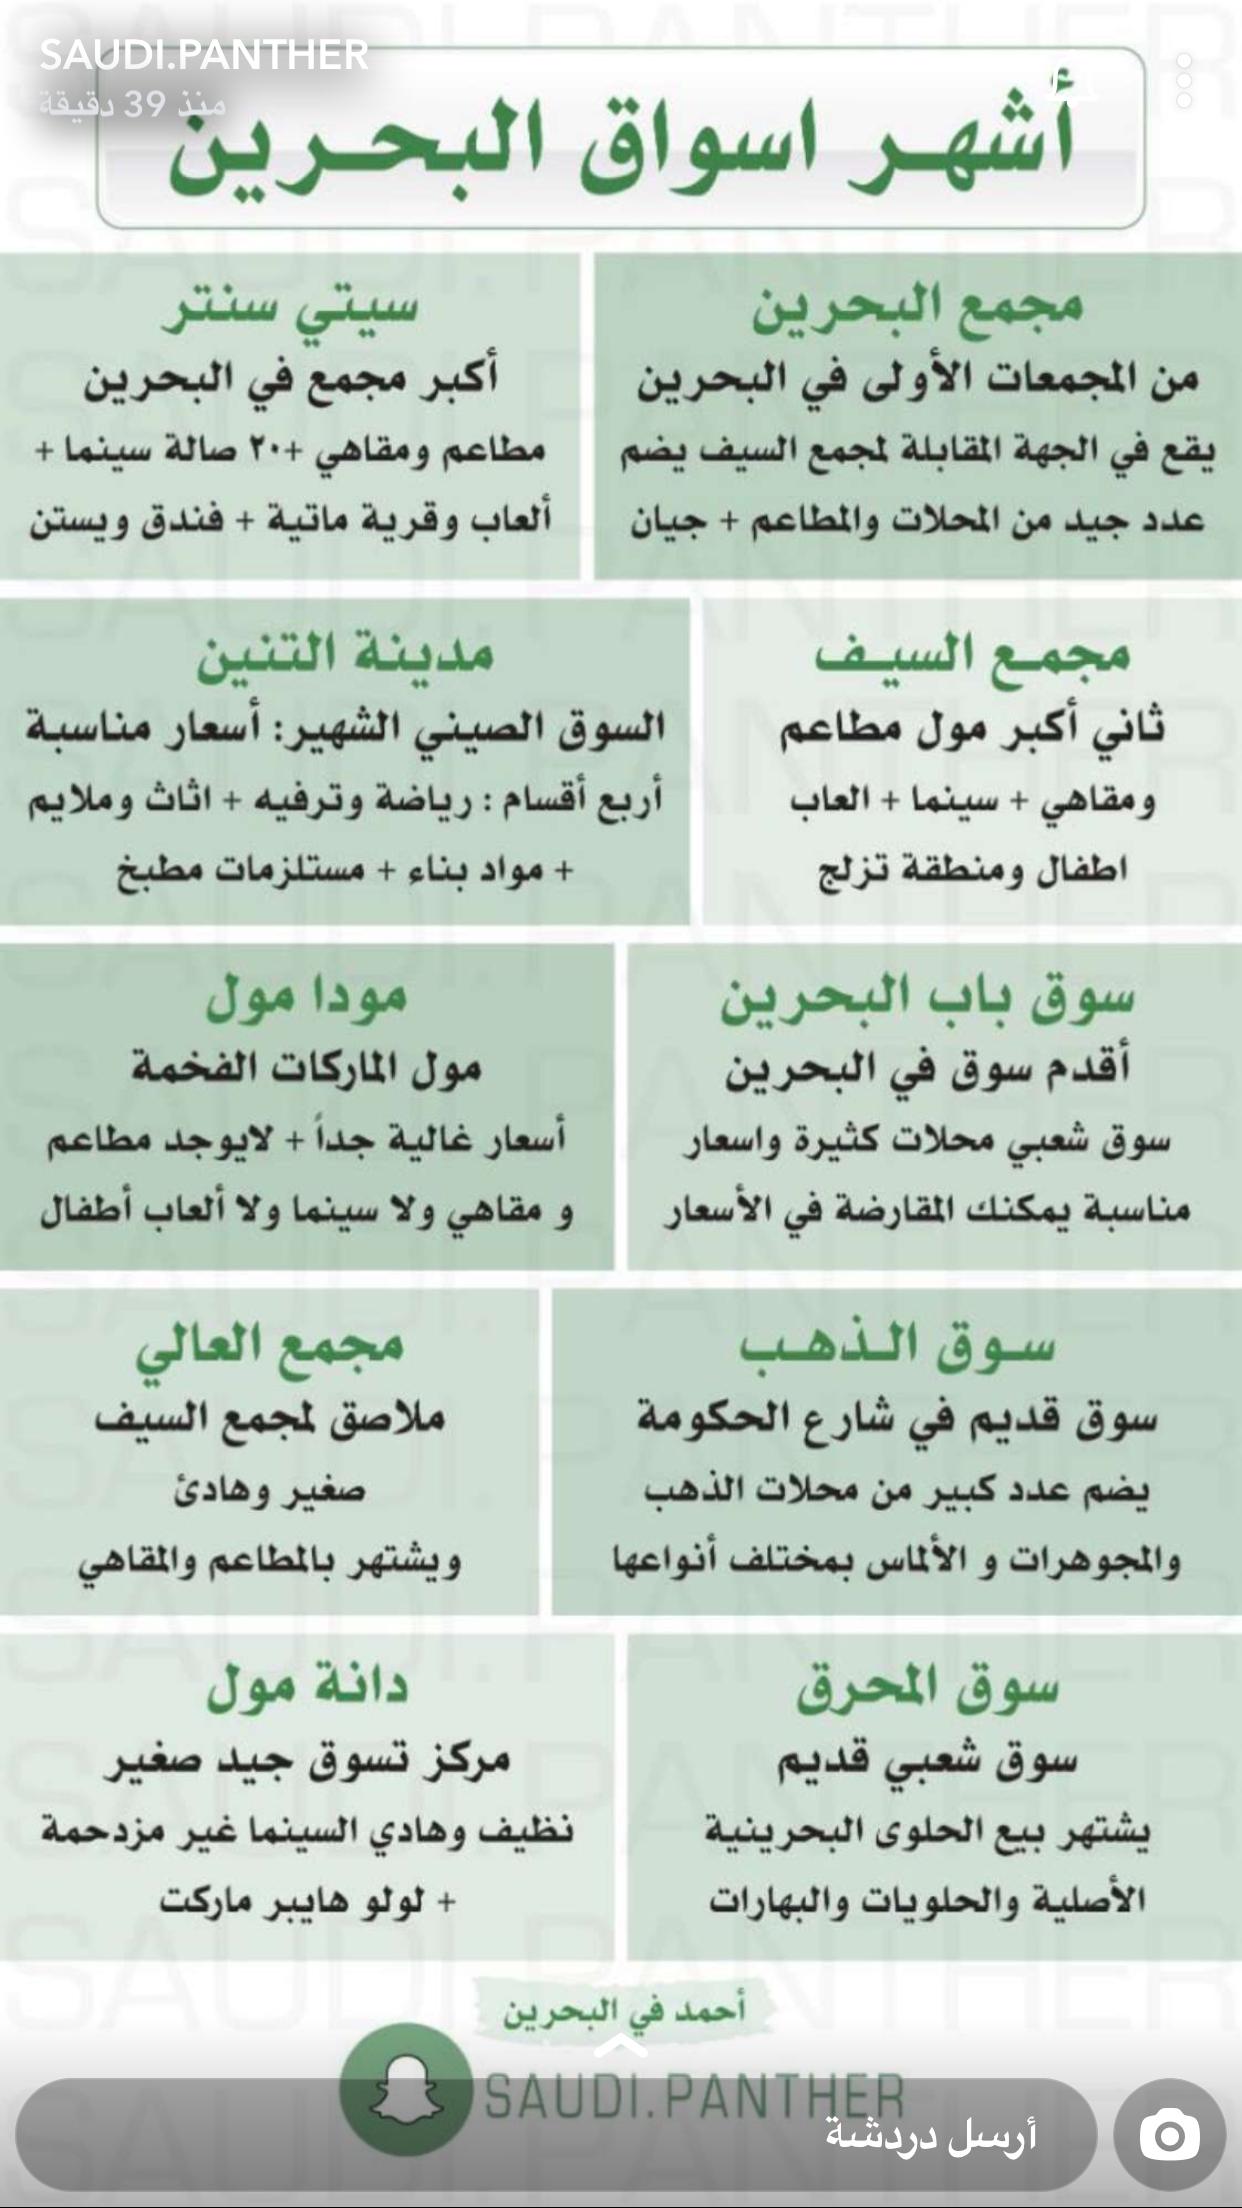 Pin By Abdulaziz Al Moagal On Travel Dubai Things To Do Travel And Tourism Travel Dreams